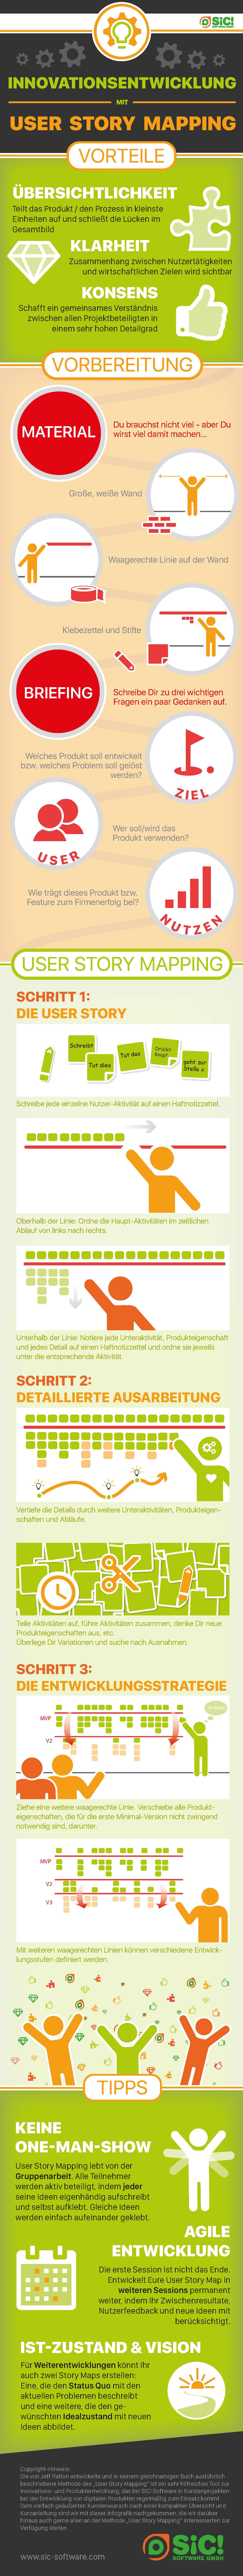 Infografik User Story Mapping, © SIC! Software, Heilbronn